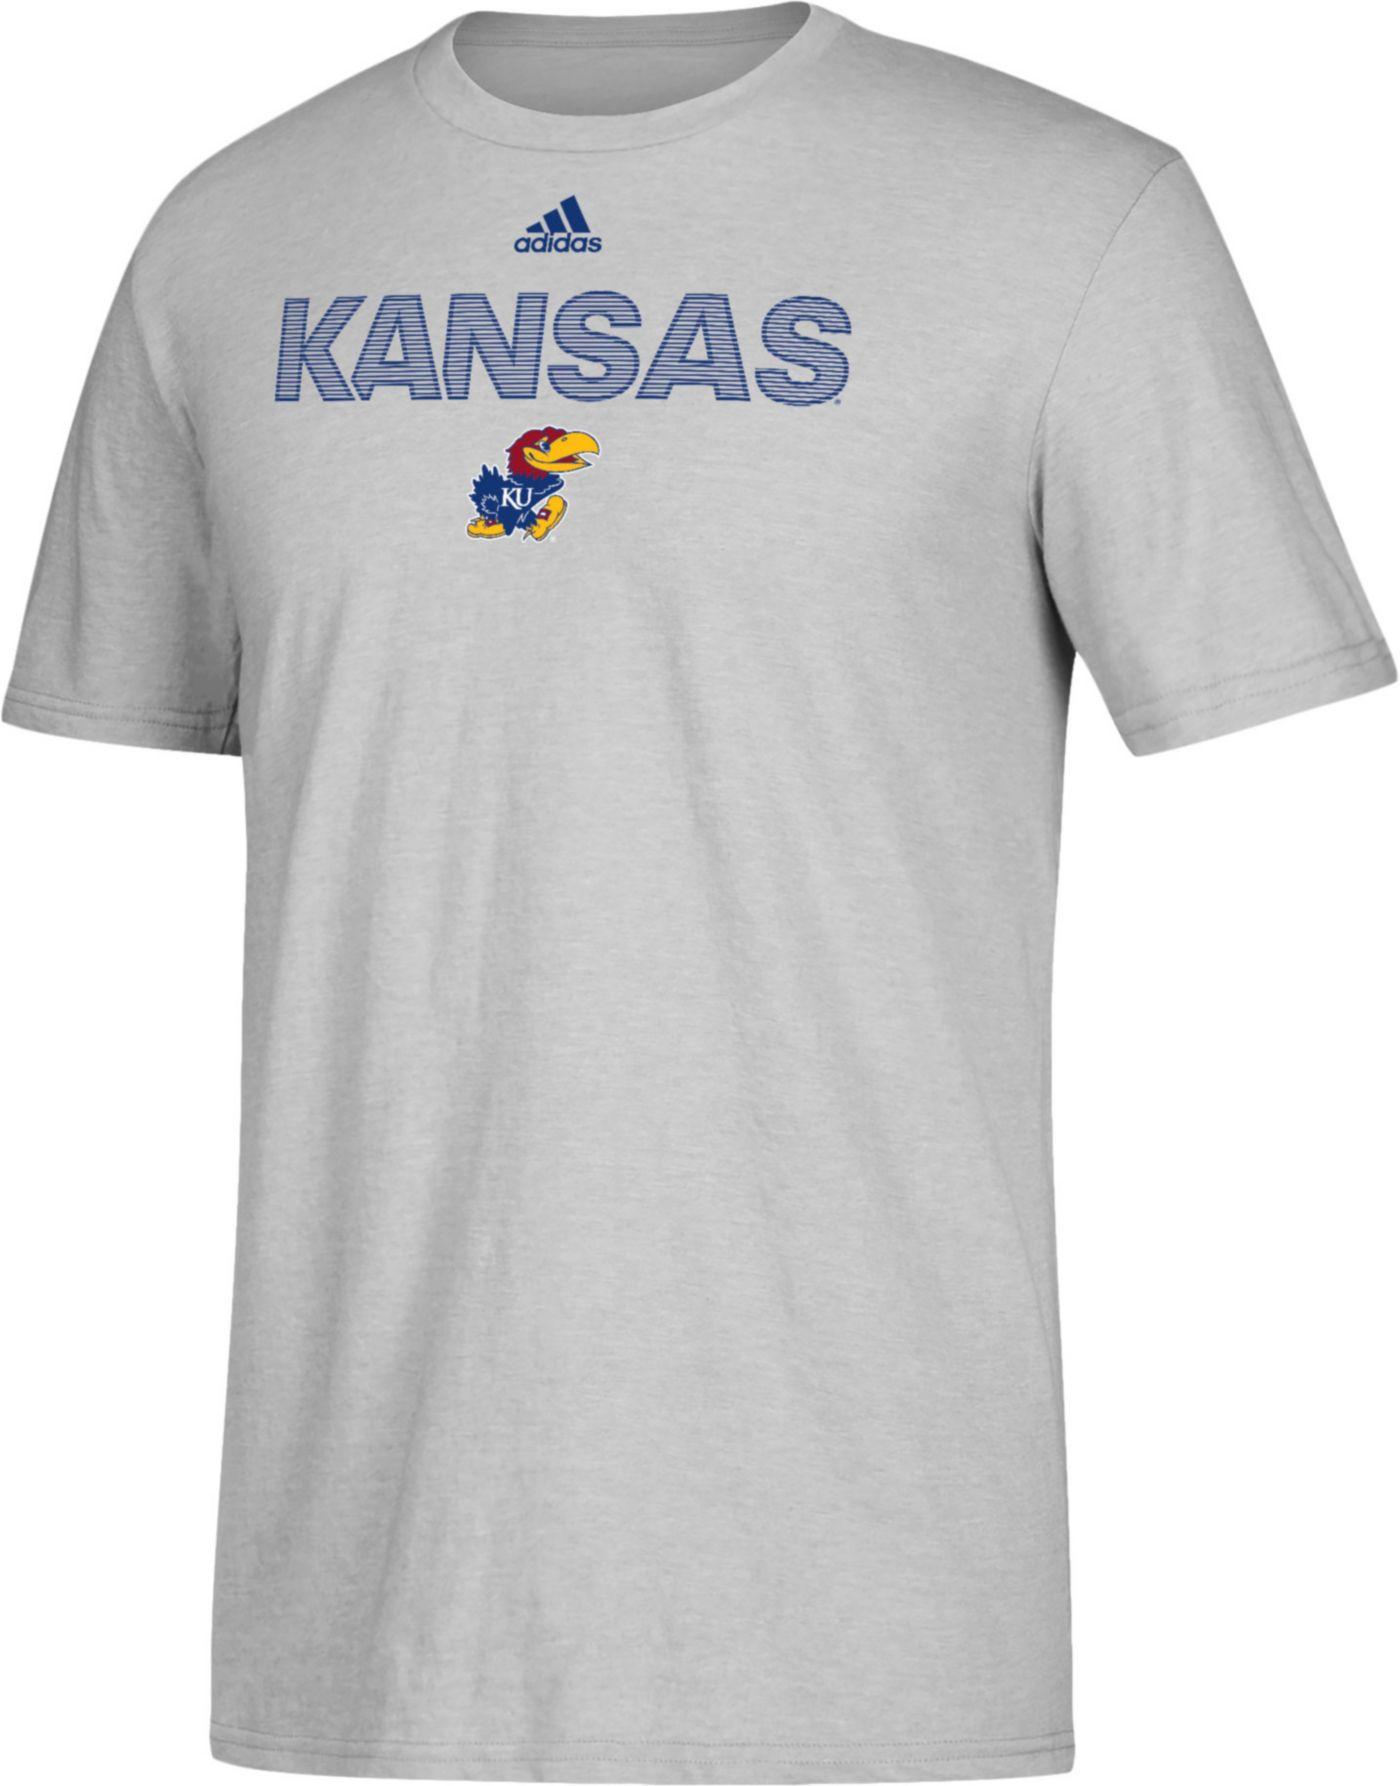 adidas Men's Kansas Jayhawks Grey Go-To Performance T-Shirt